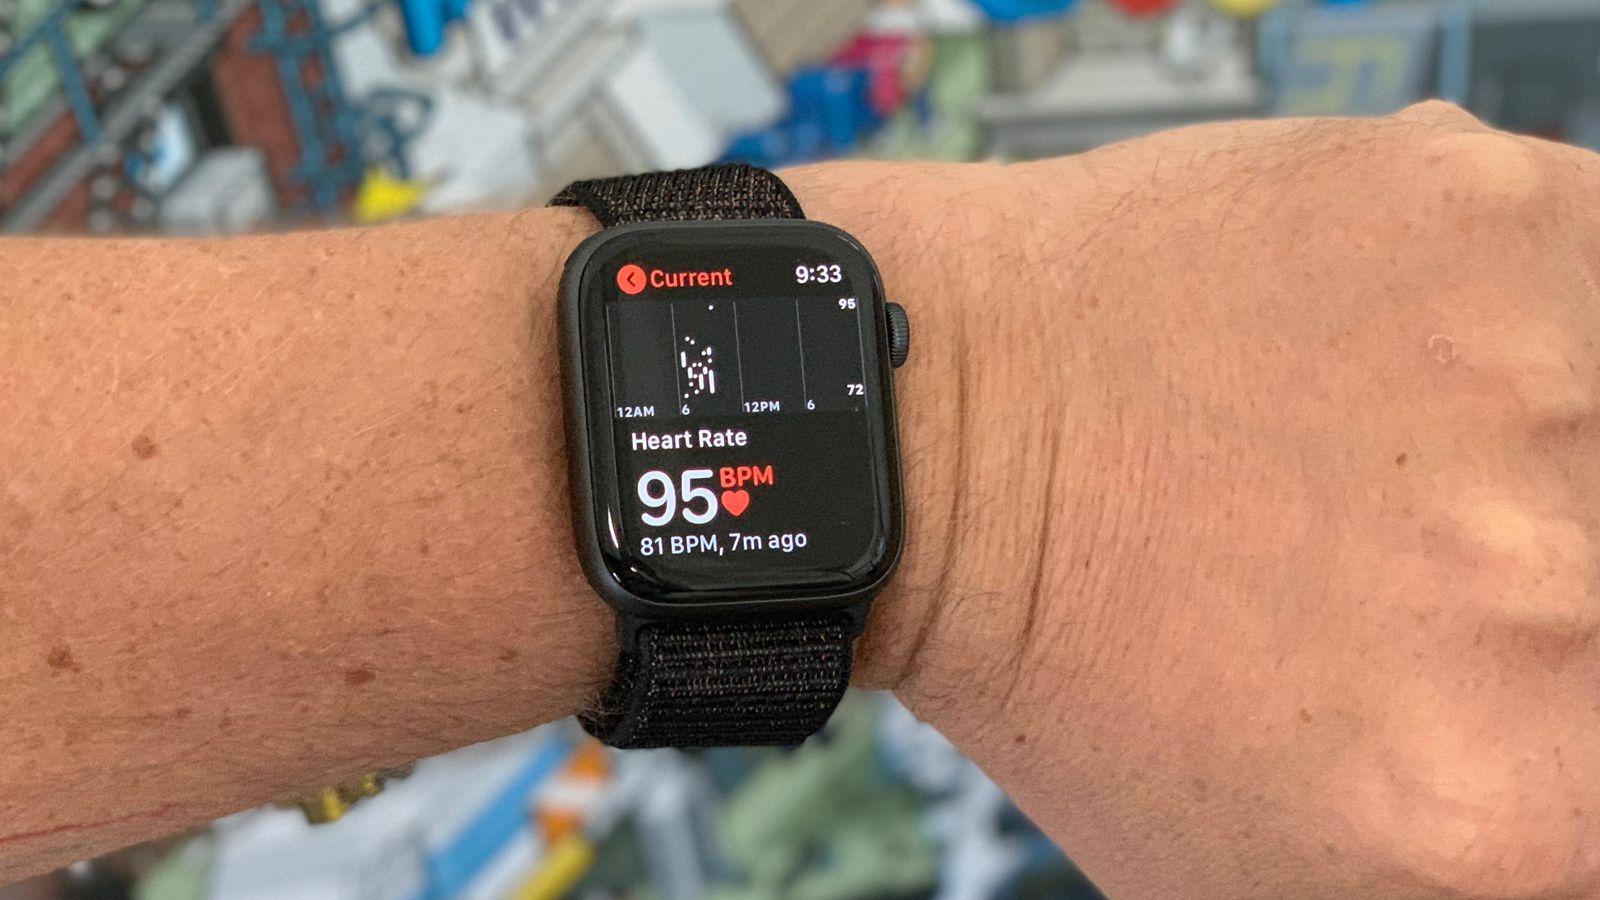 watchos 5 heart rate recording